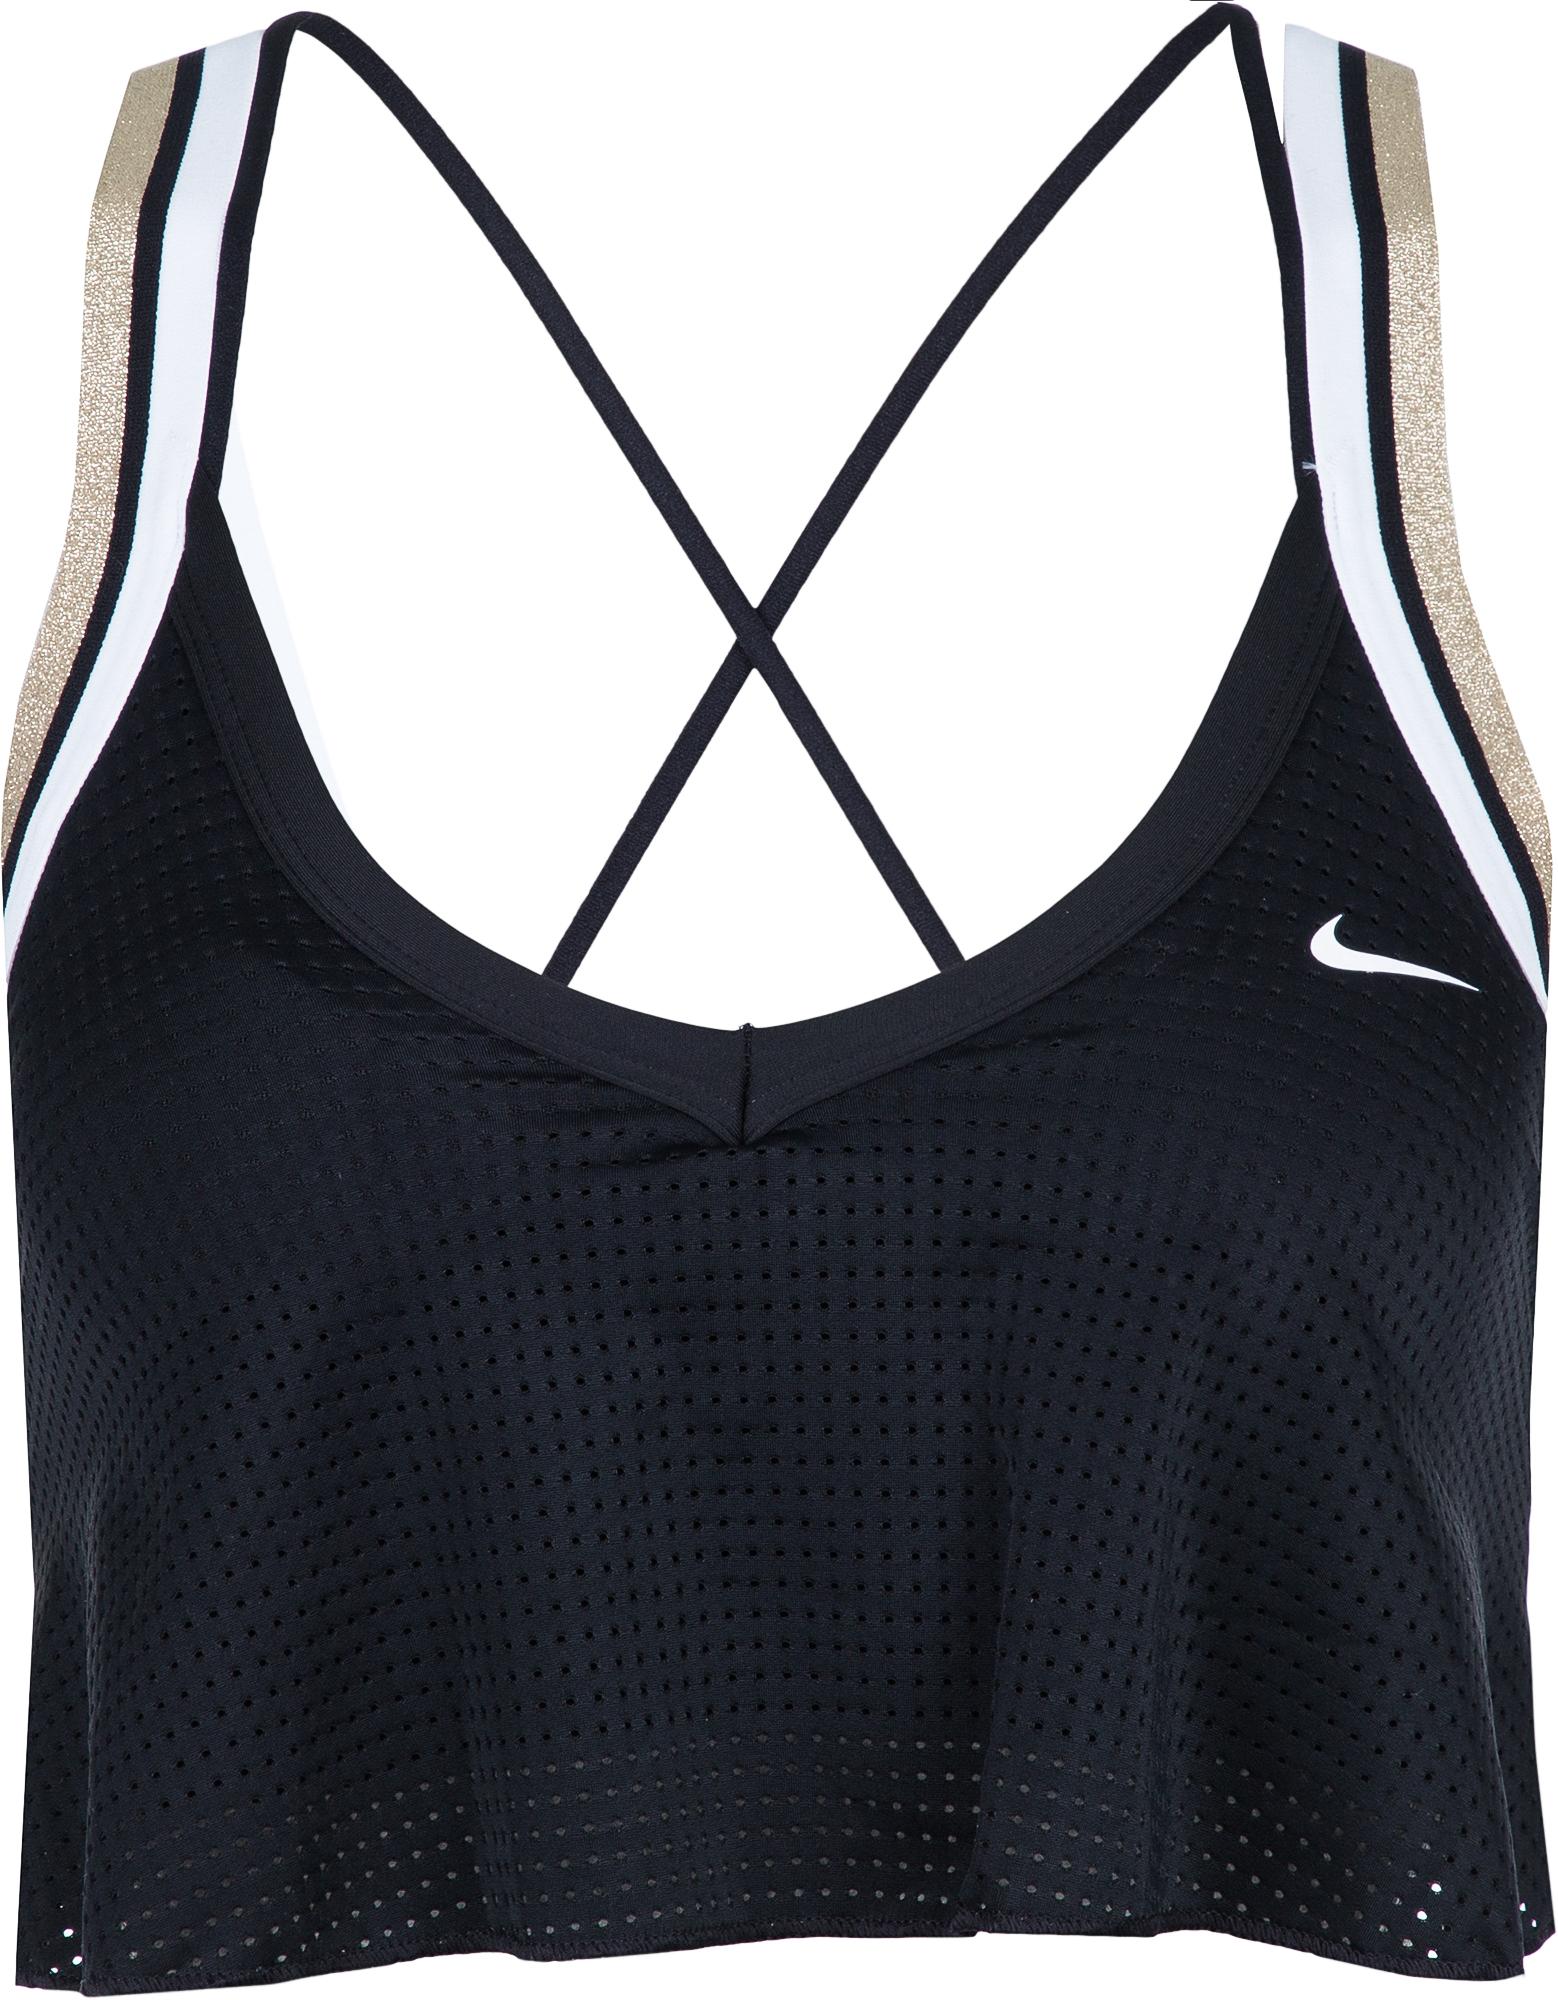 Nike Спортивный топ бра Nike, размер 48-50